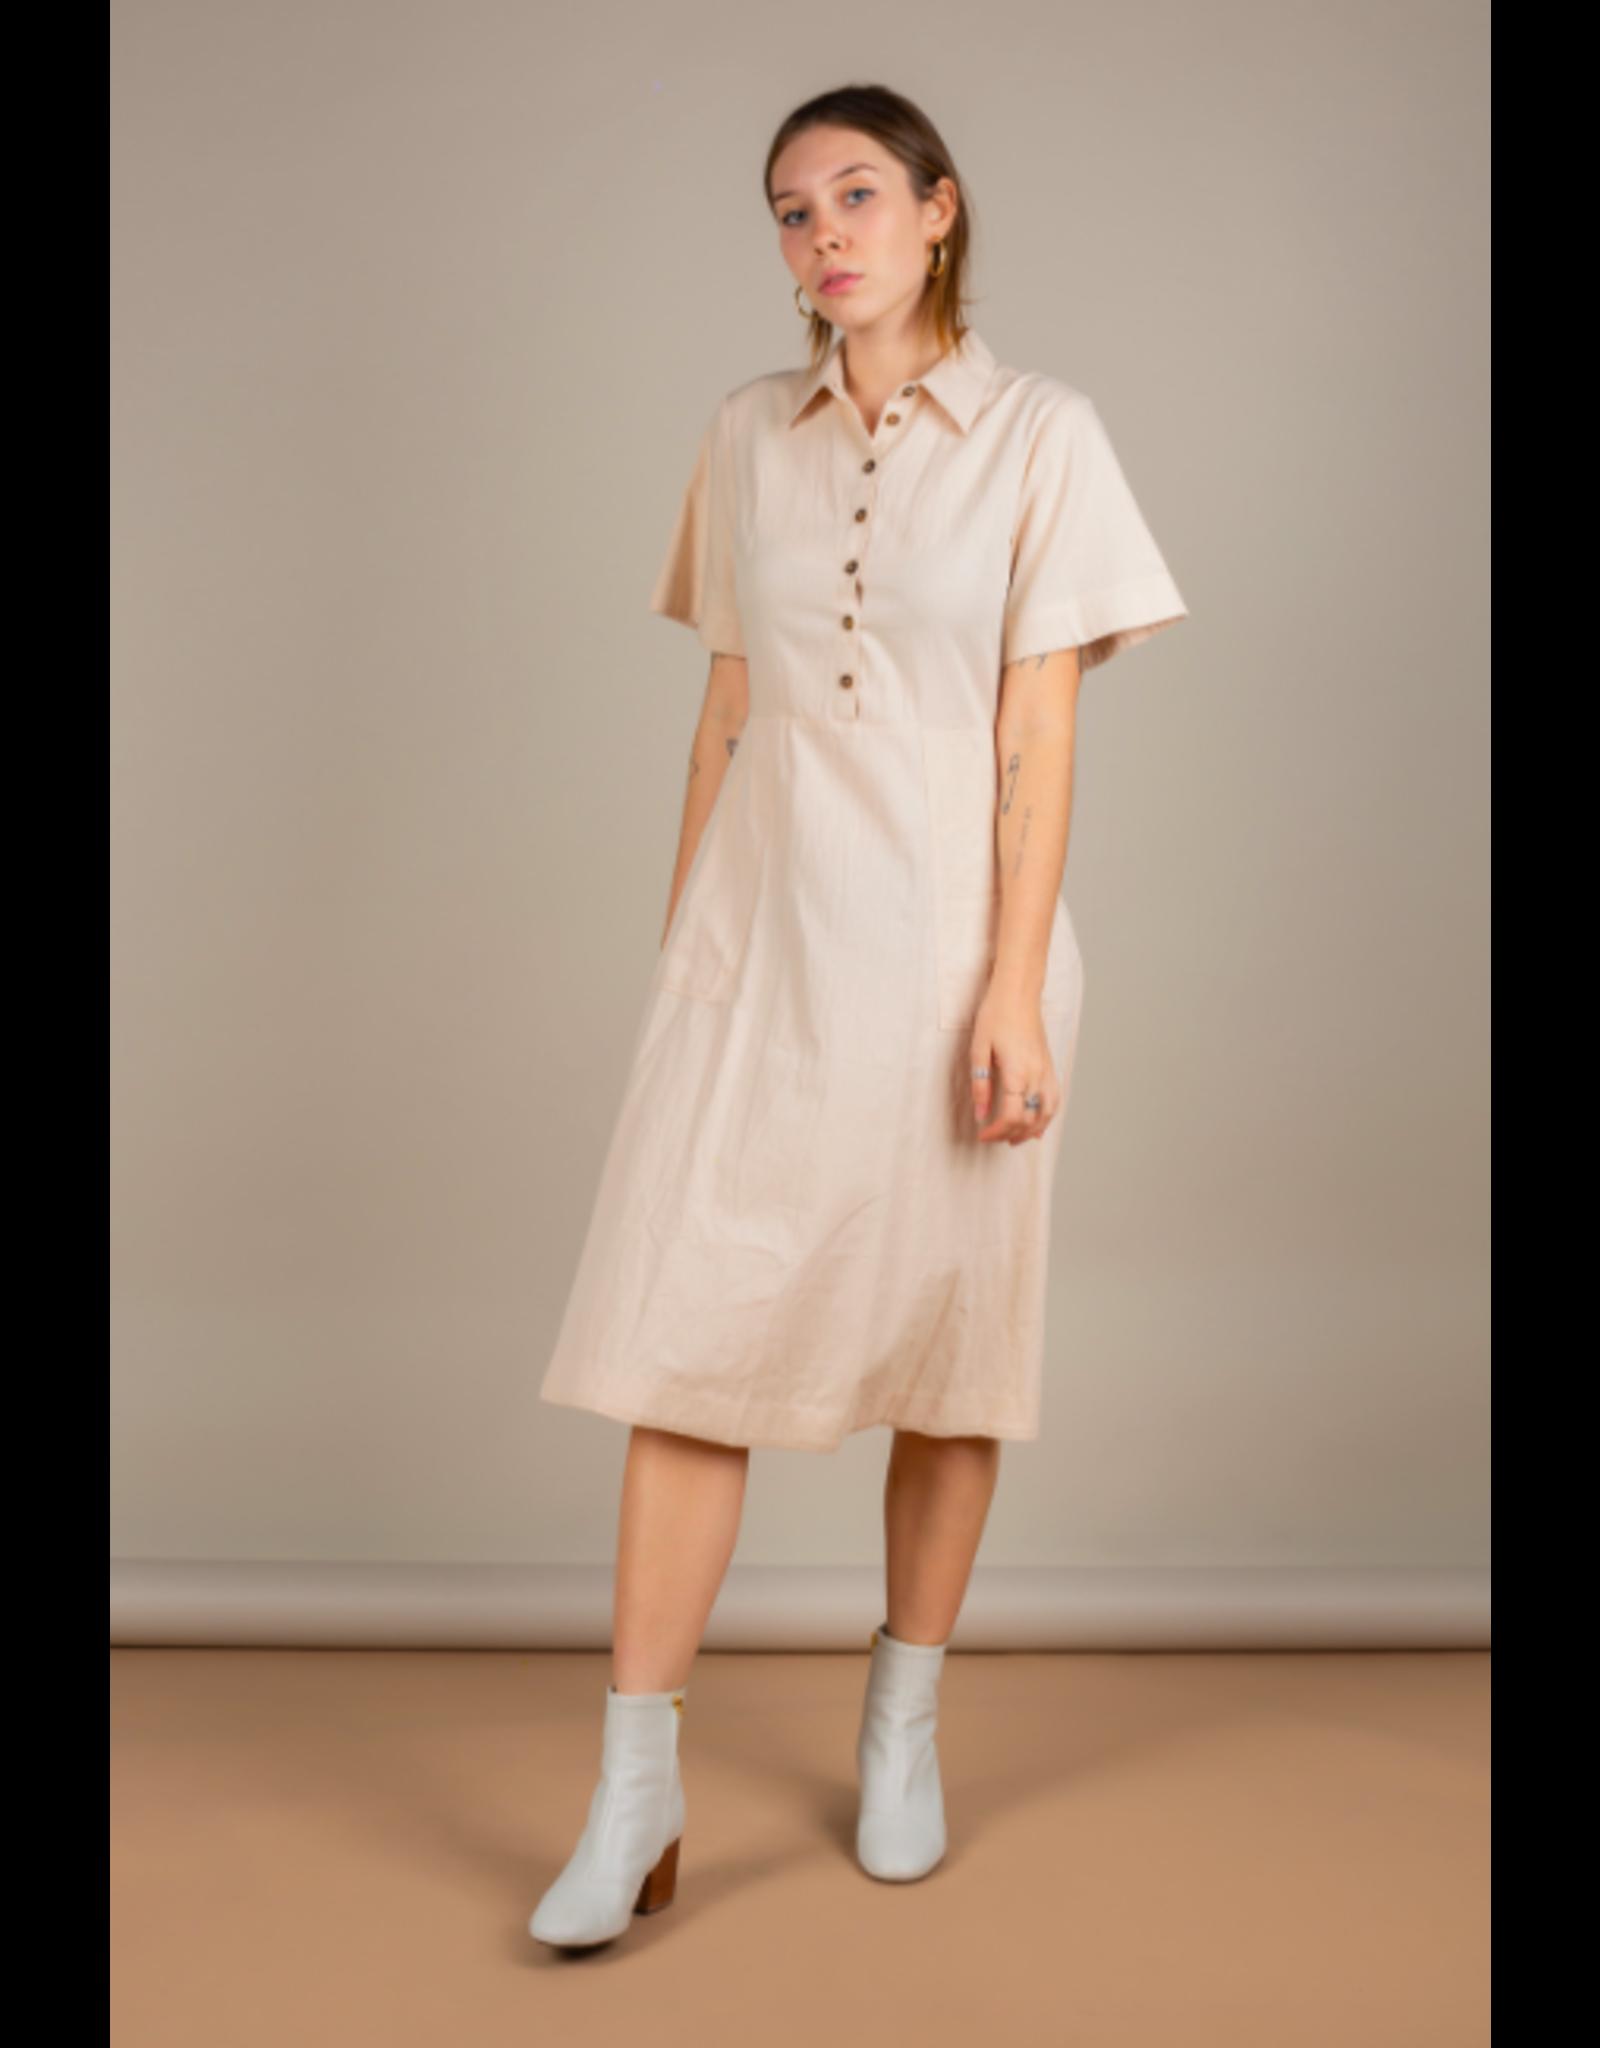 SALE - No Less Than - Button Up Dress